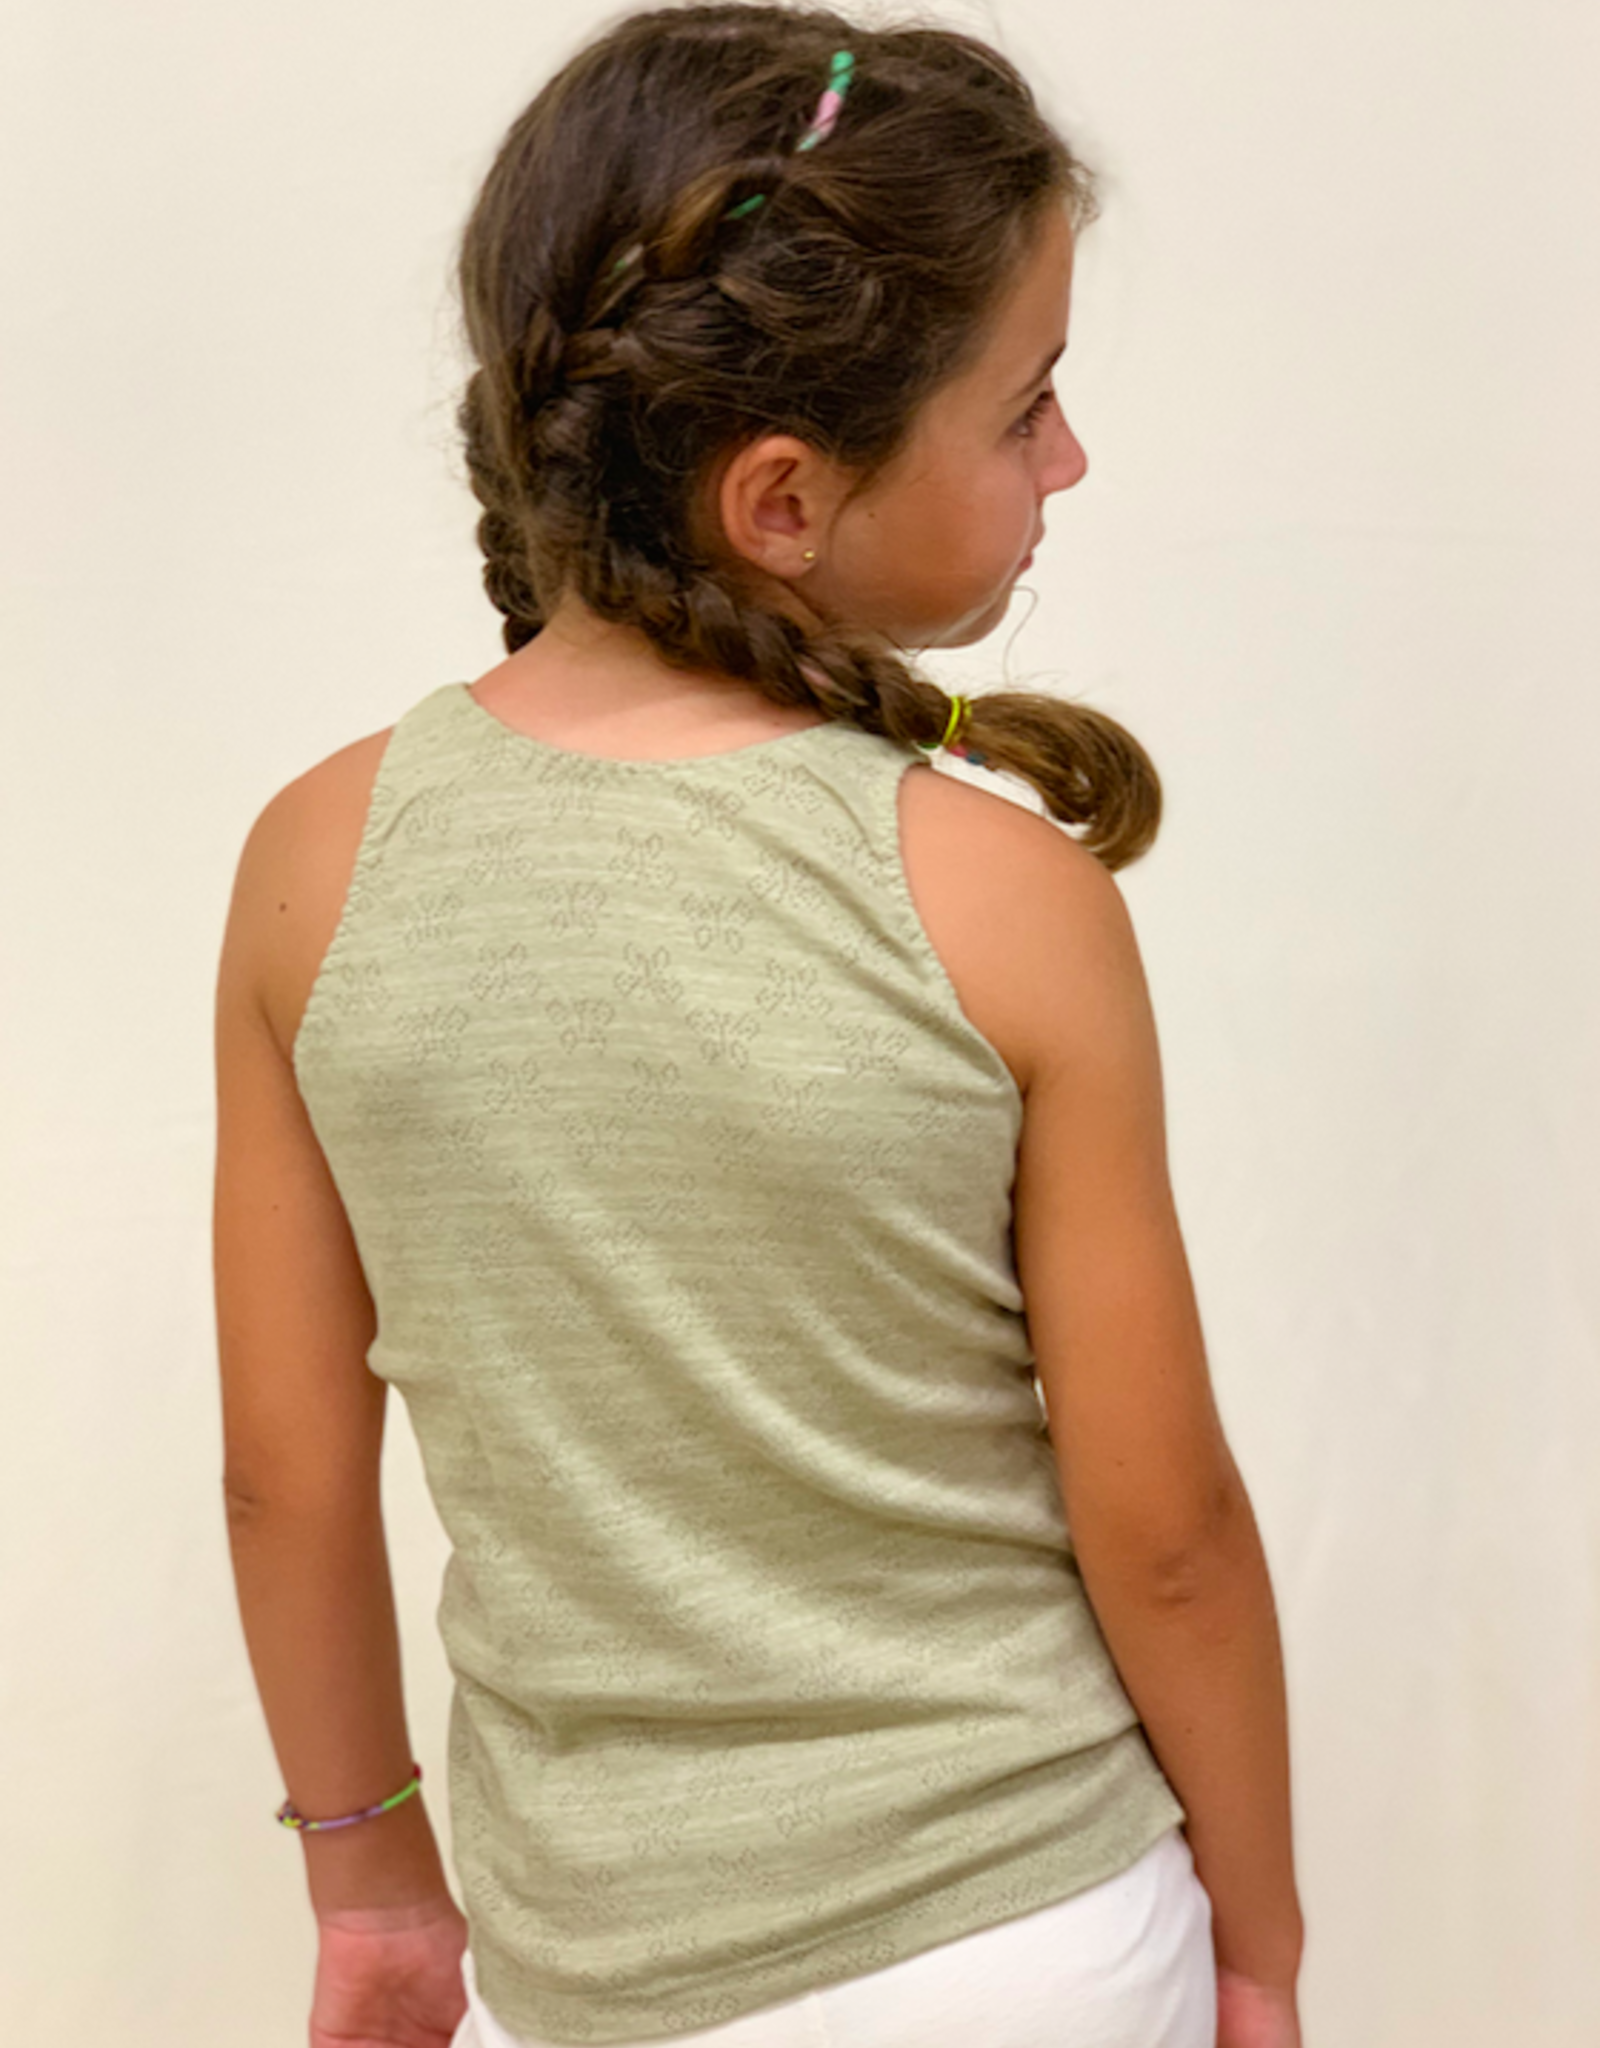 Camiseta junior calada con tirantes. Tallas 8, 10, 12.